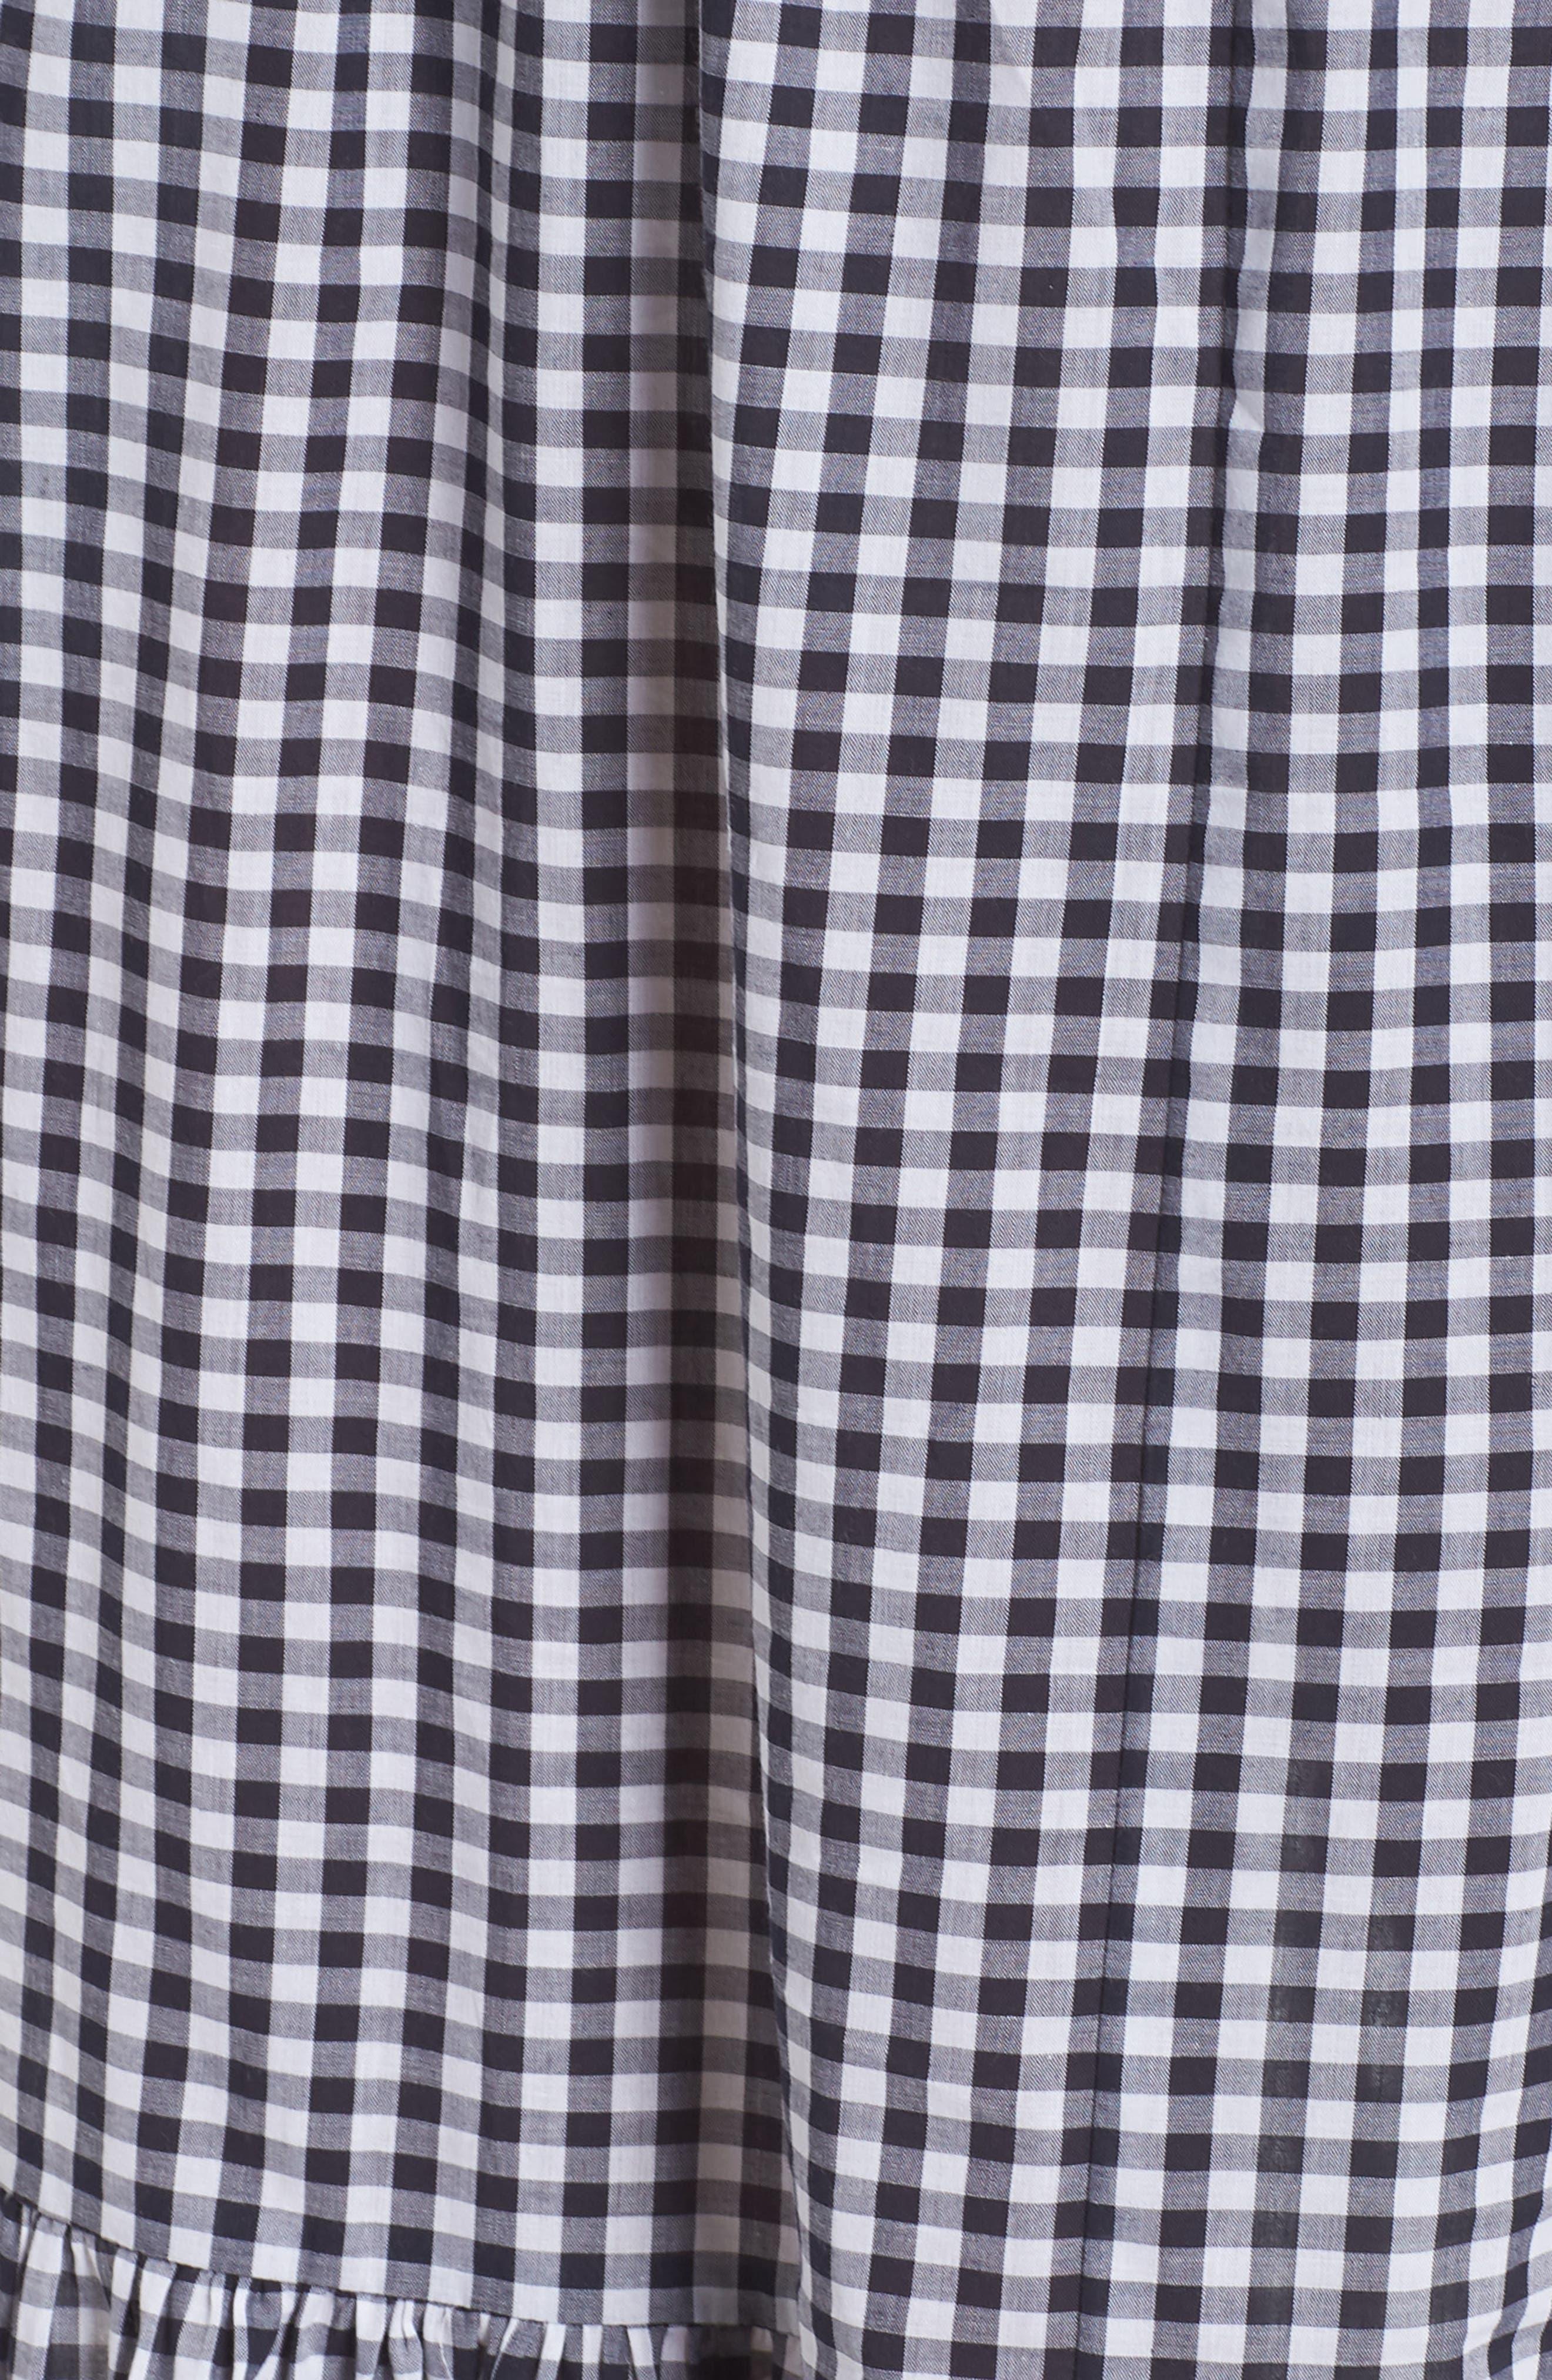 Off the Shoulder Gingham Maxi Dress,                             Alternate thumbnail 5, color,                             Blue White Gingham